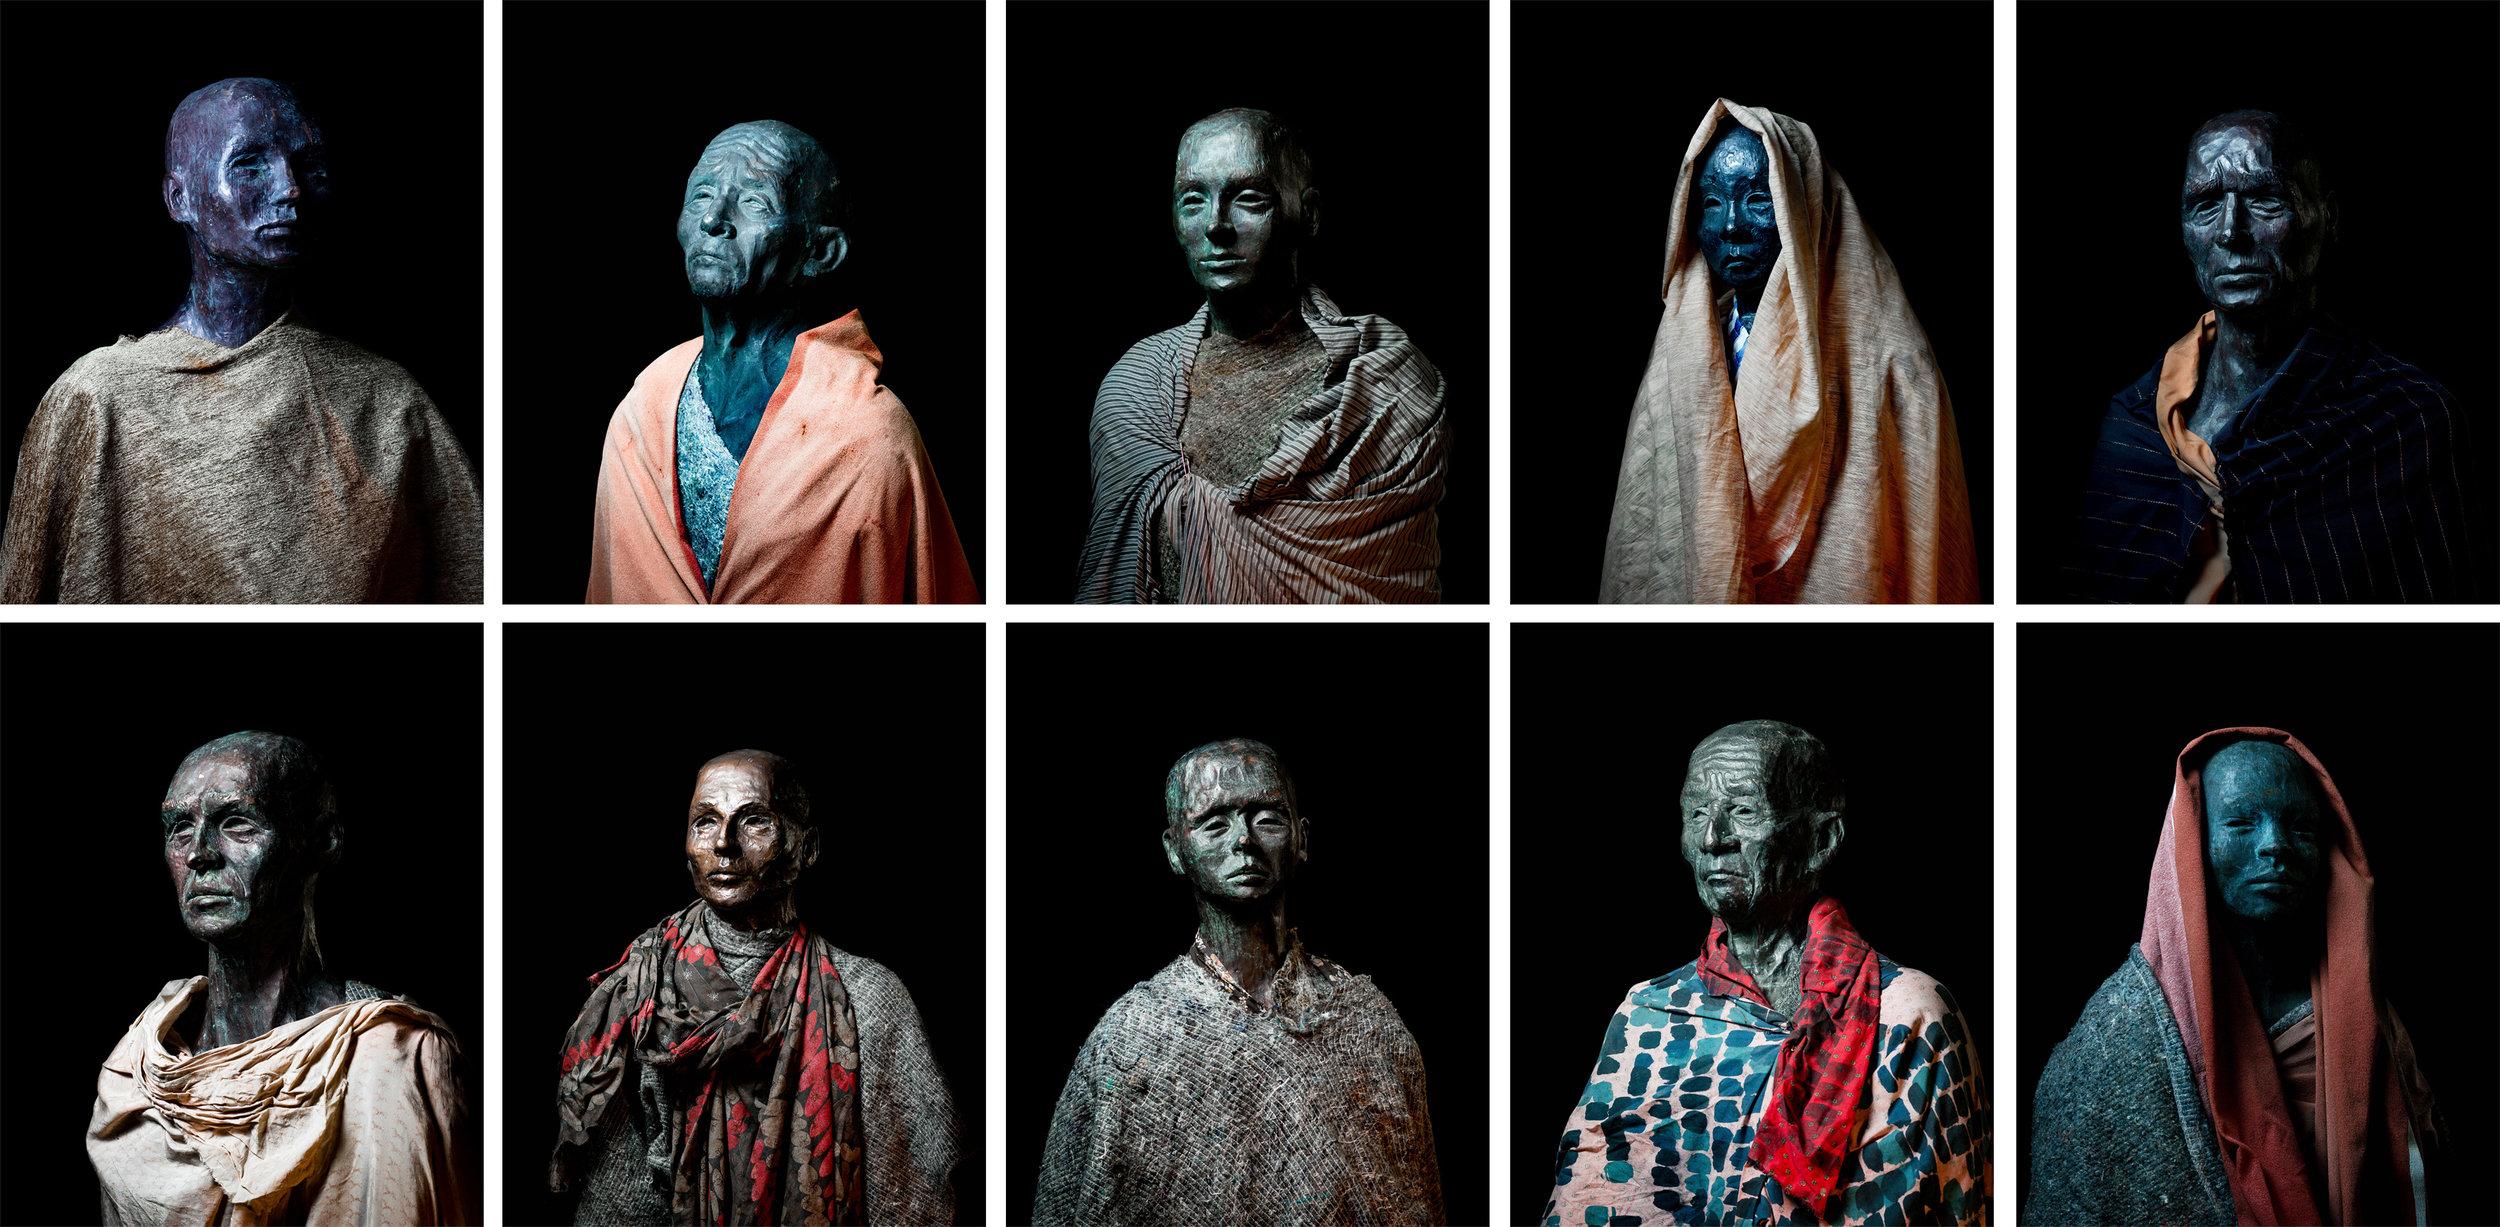 "climate refugees || sculptures by Jens Galshiøt || Part of the project ""Mit Sicherheit gut ankommen - ein sozial-kulturelles Schiffsprojekt"" www.msgan.de"